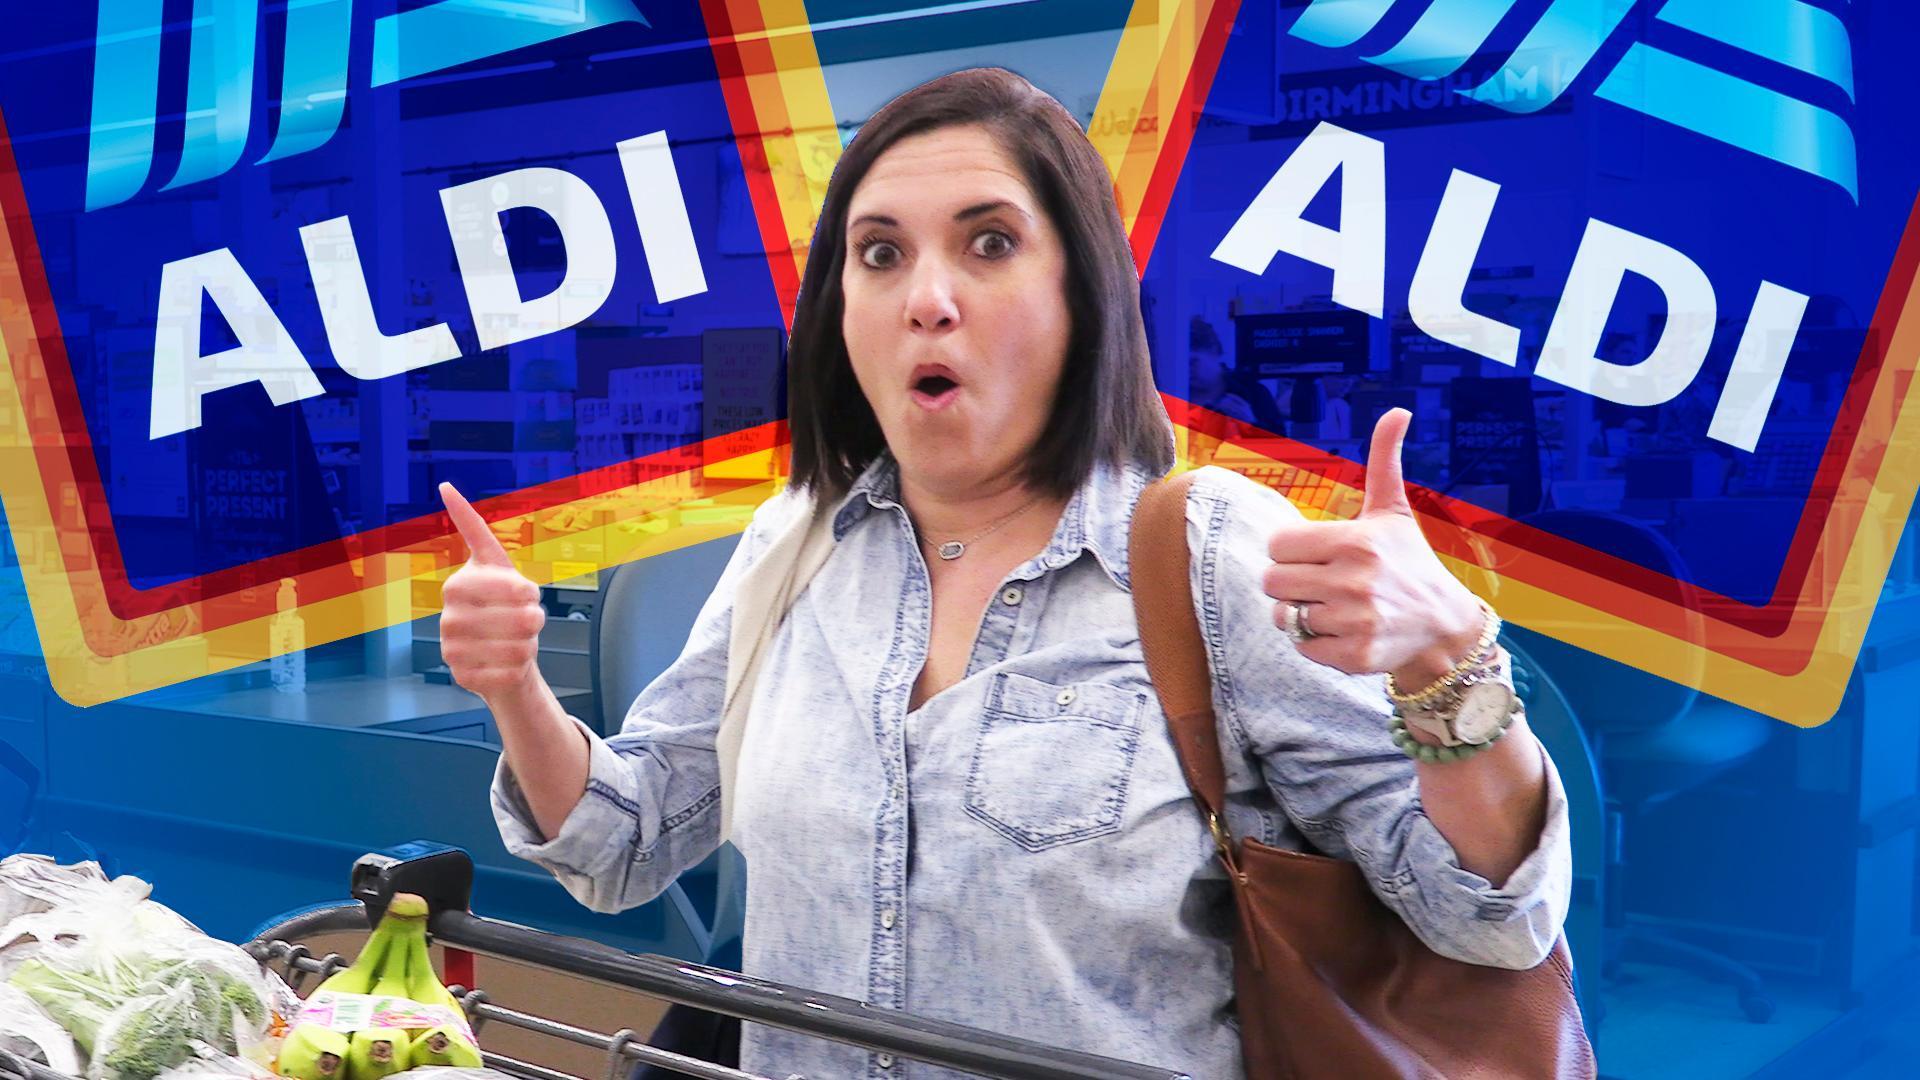 Mom vs  the Supermarket